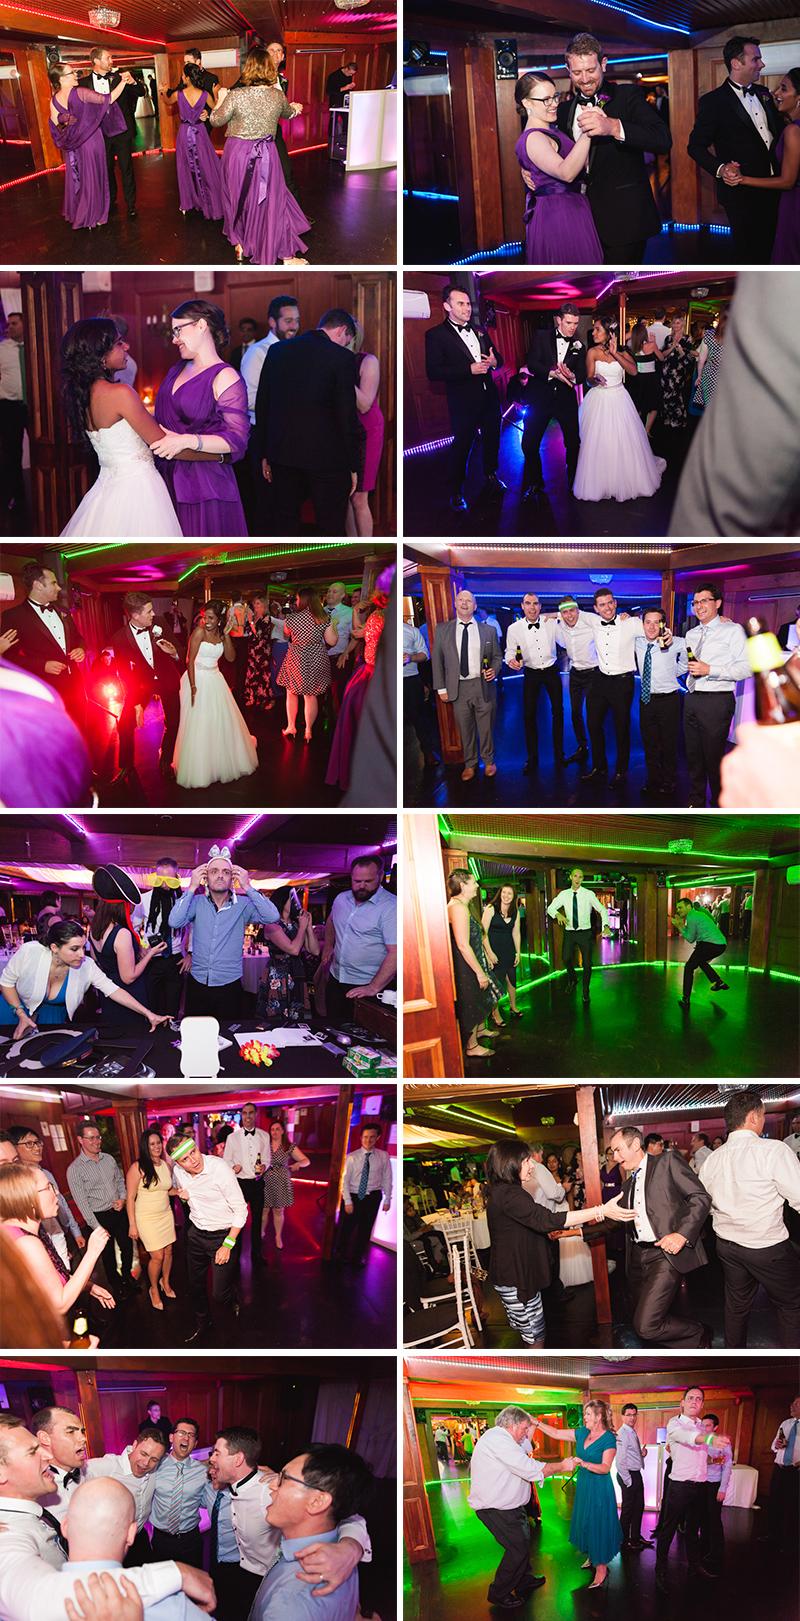 62-Glengariff_wedding_photographer.jpg